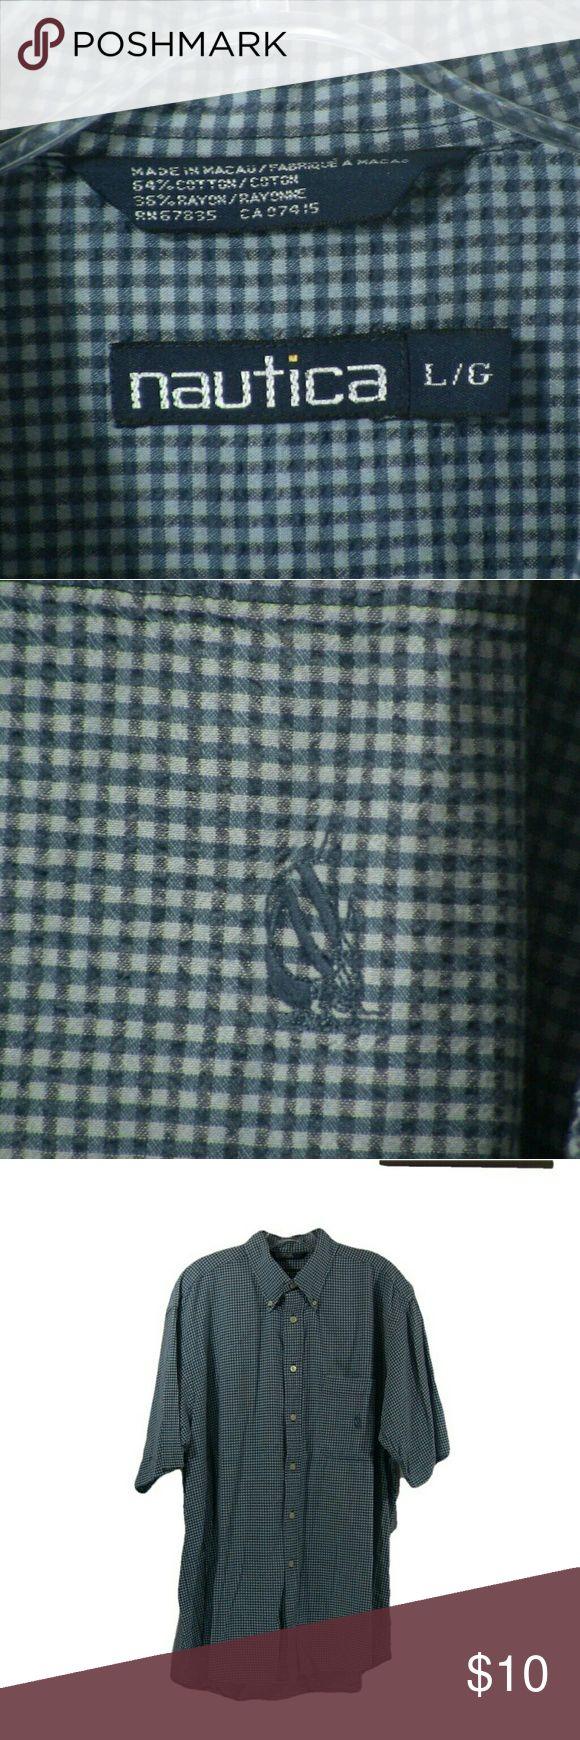 Nautica short sleeve dress shirt  00042 Pre-owned, gently uses men's shoet sleeve dress shirt Nautica Shirts Casual Button Down Shirts